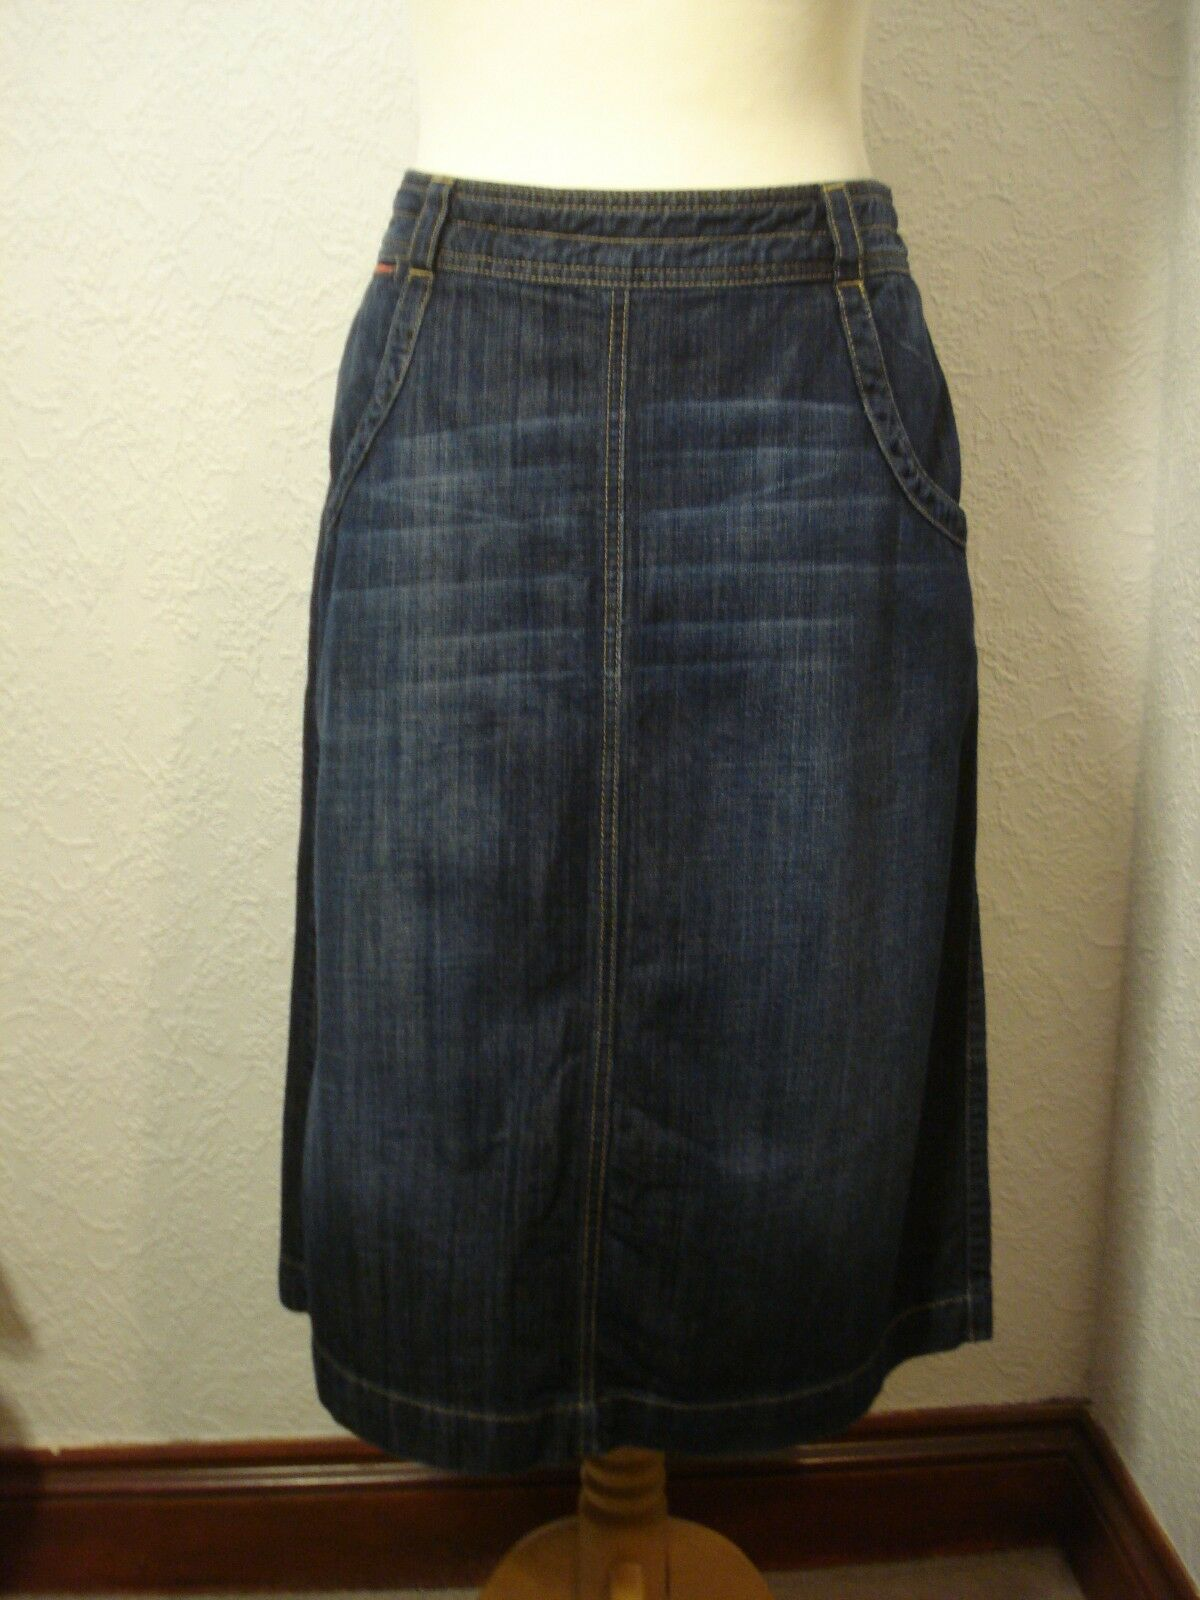 White Stuff dark bluee below knee denim skirt 10-12